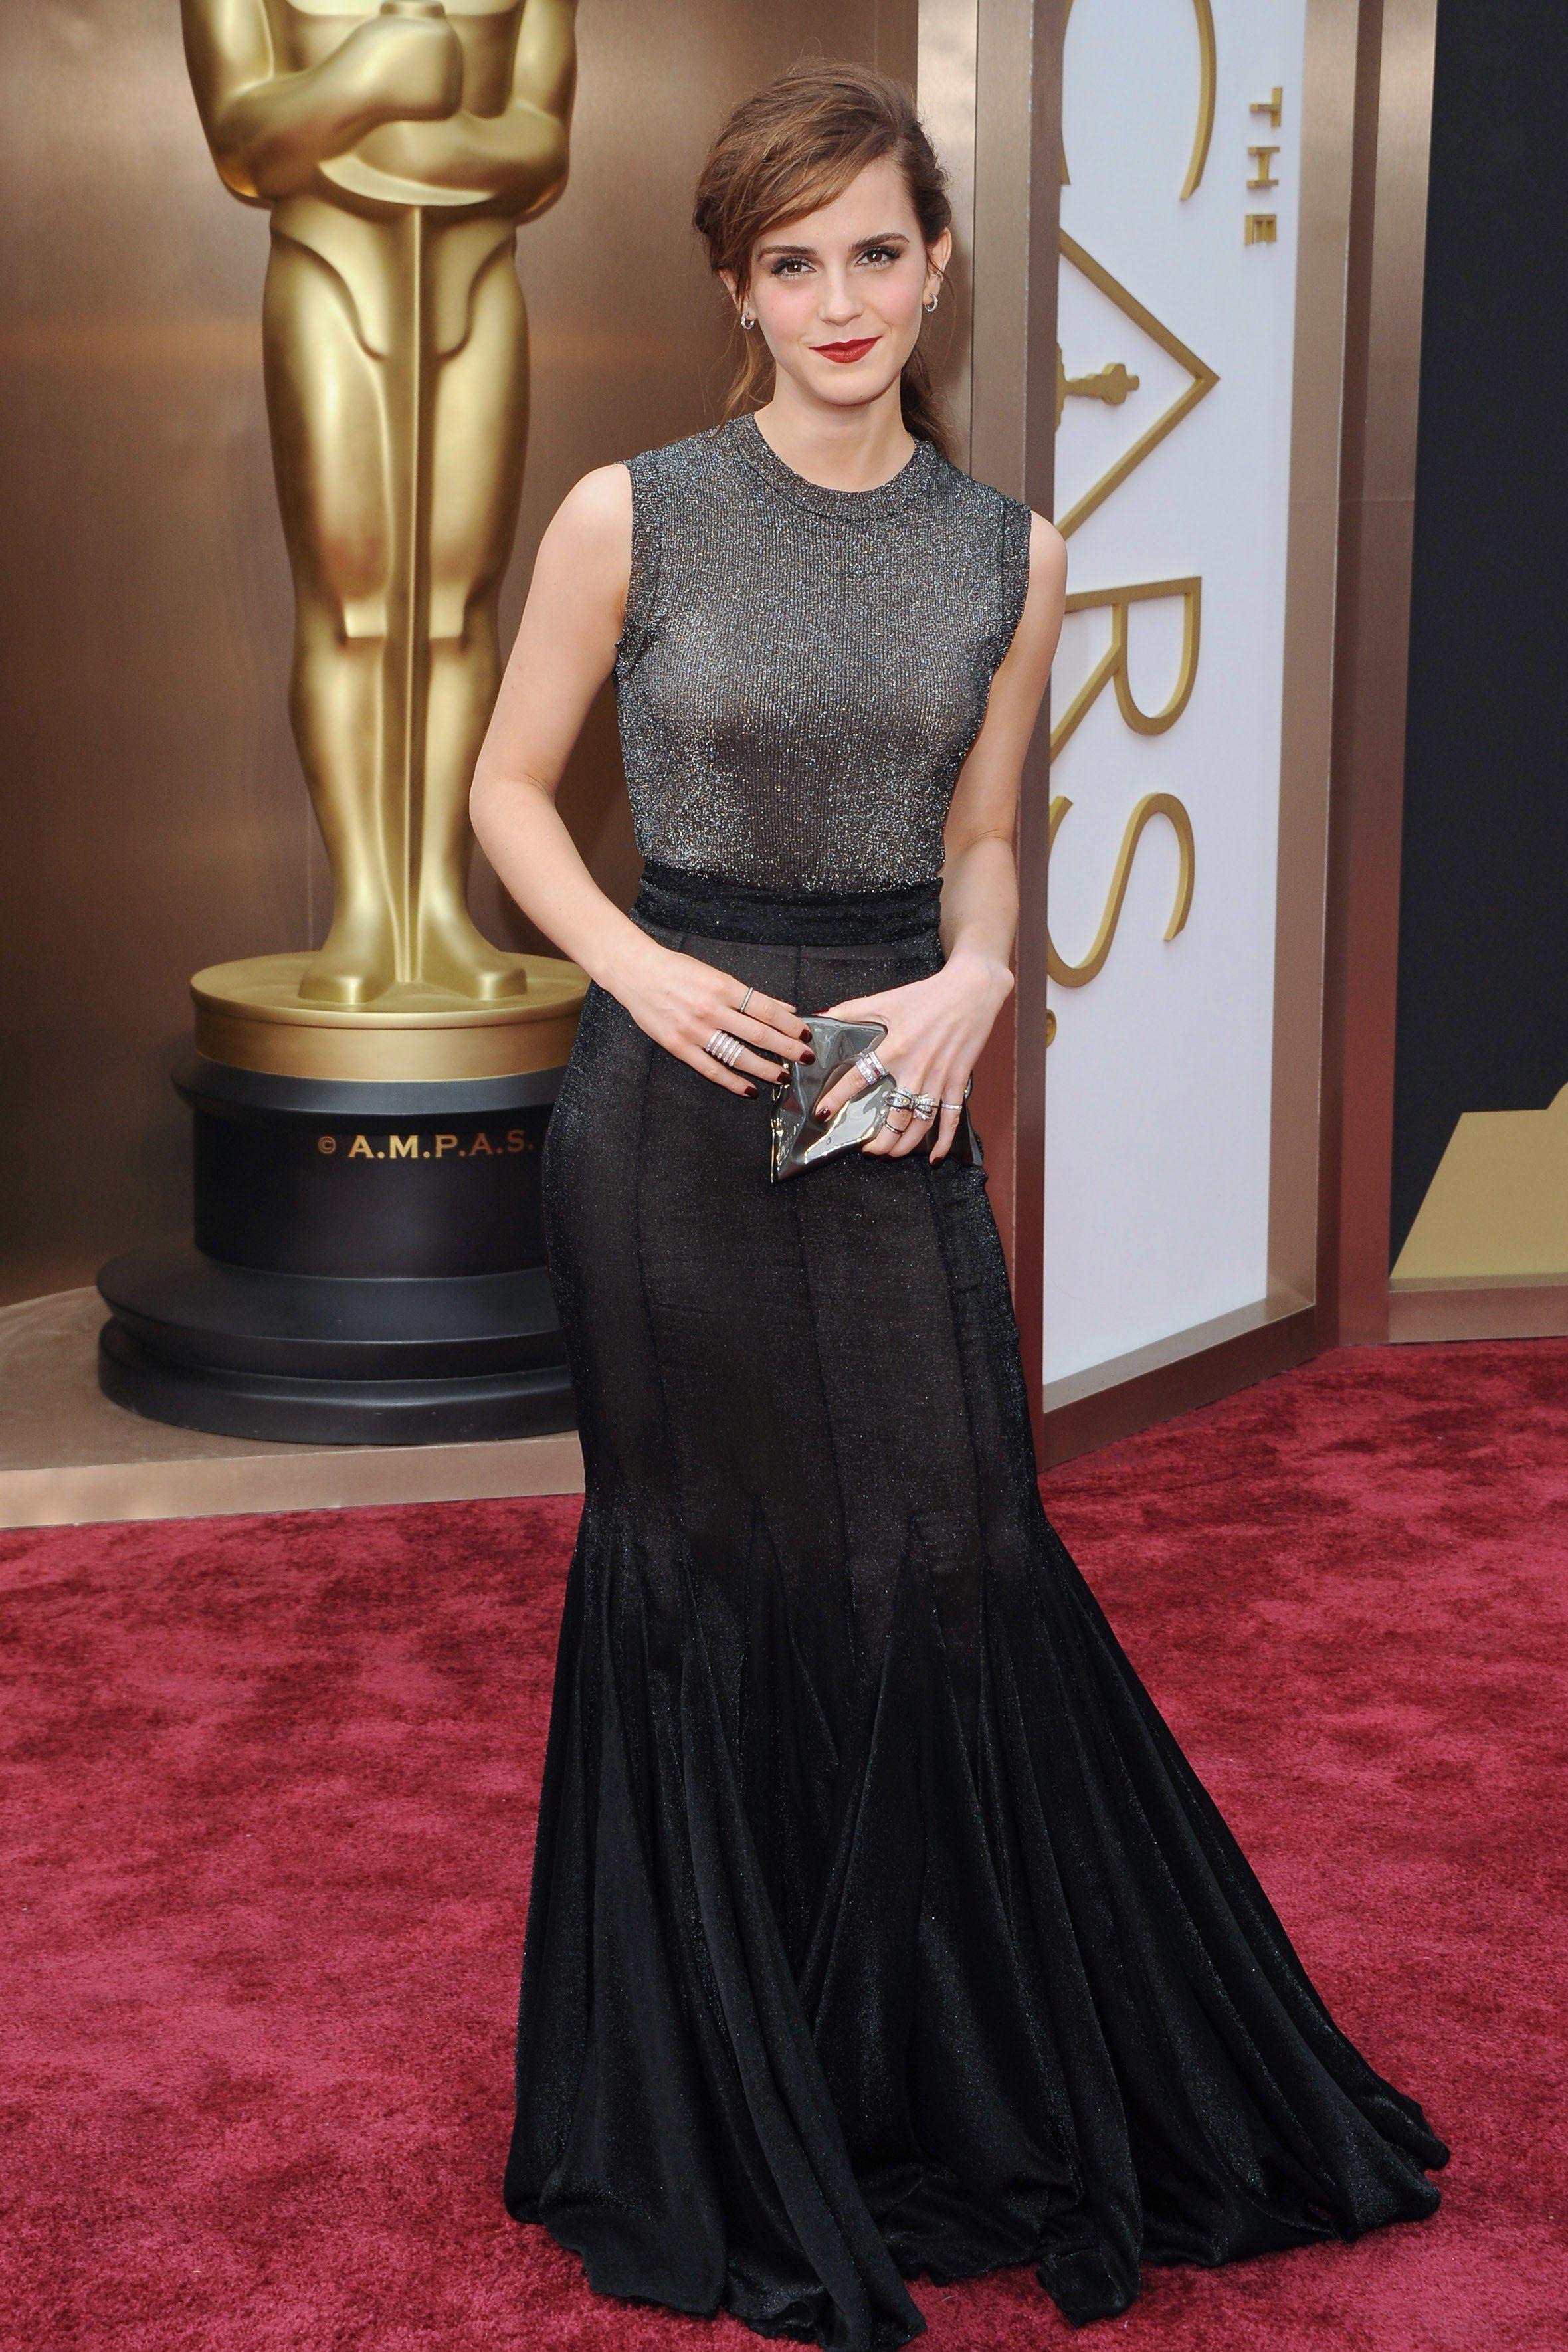 The 17 Best Oscars Red Carpet Looks of All Time   Emma watson style,  Ladylike dress, Emma watson